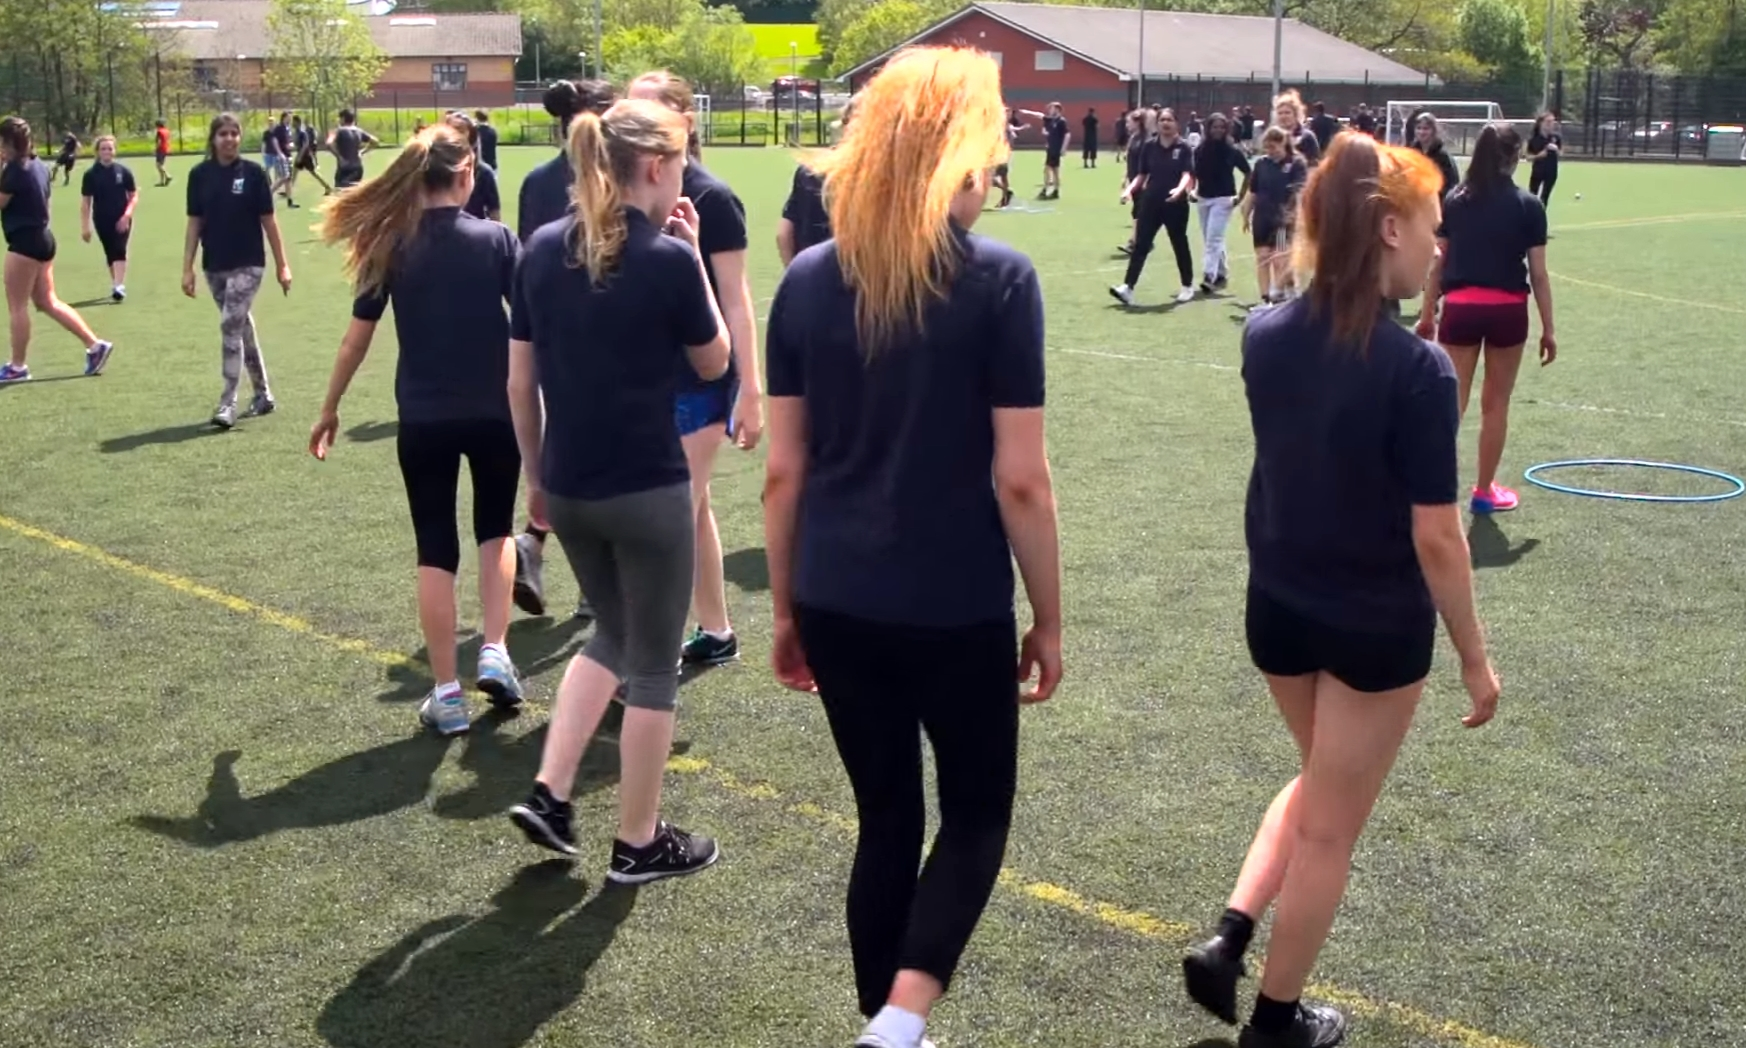 The sportscotland award celebrates those schools who make extra effort to promote healthy exercise.